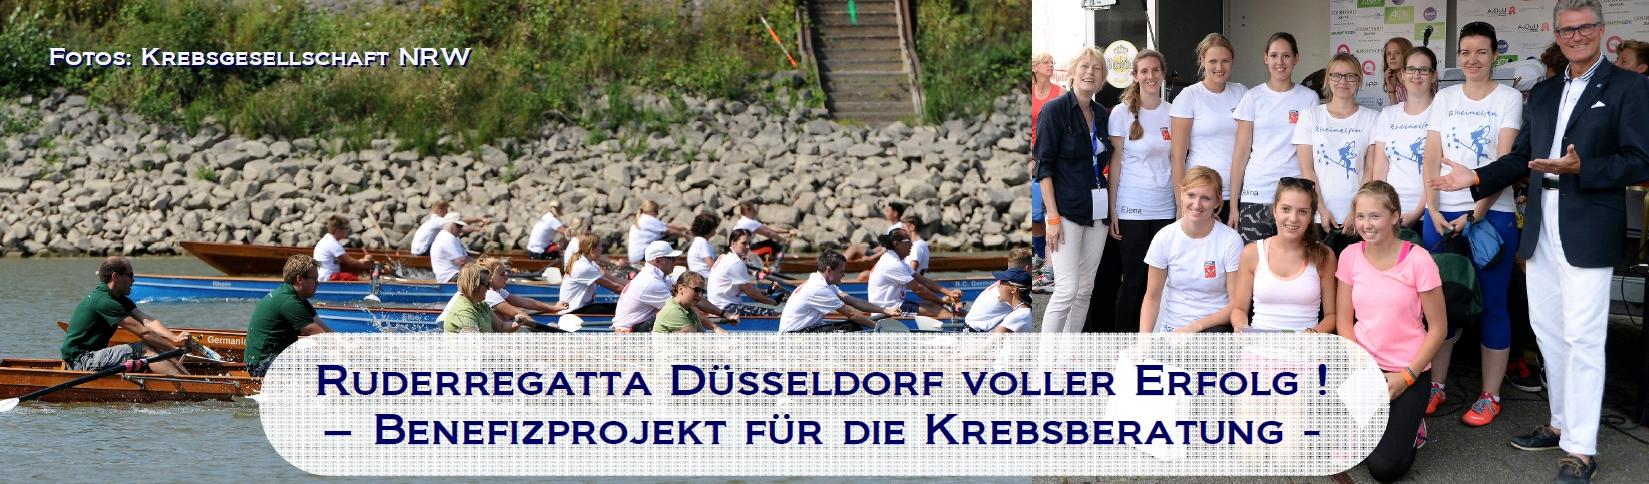 JPG_Ruderregatta D voller Erfolg - Benefizprojekt d Krebsgesellschaft NRW und Ruderclub Germania